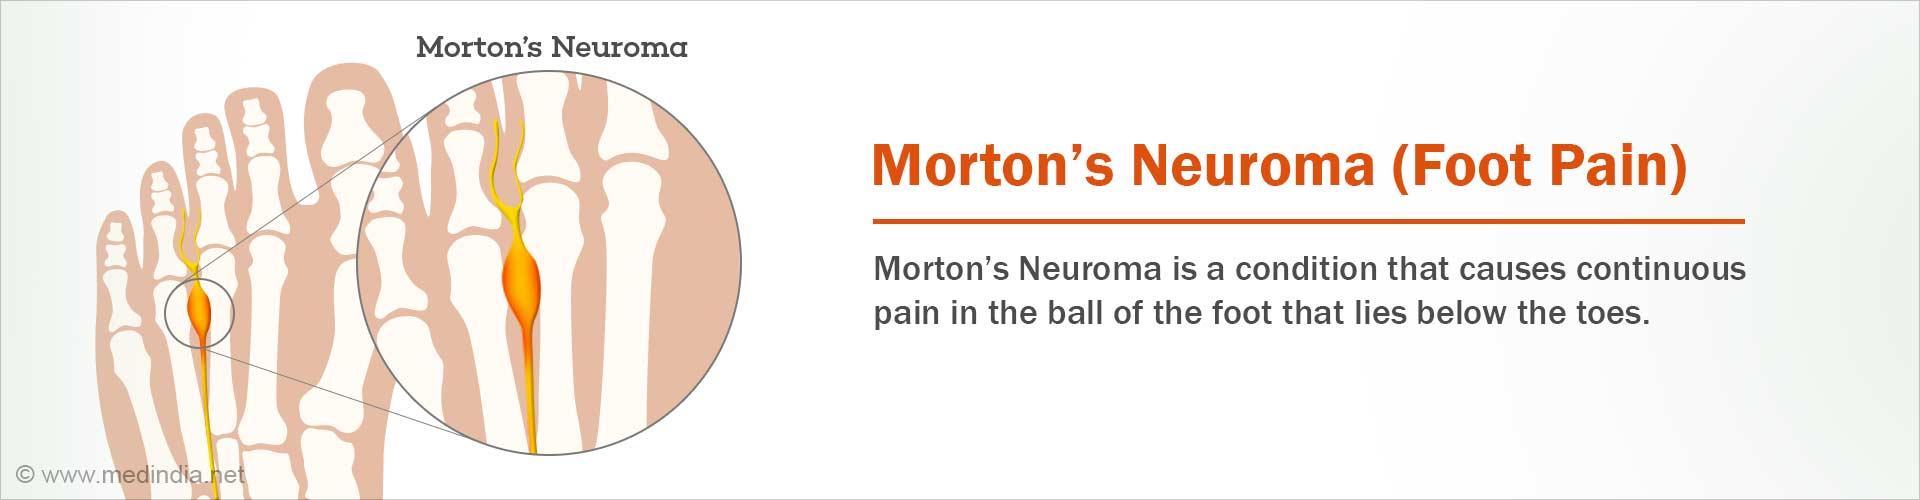 Morton's Neuroma - Causes, Symptoms, Diagnosis, Treatment, Prevention